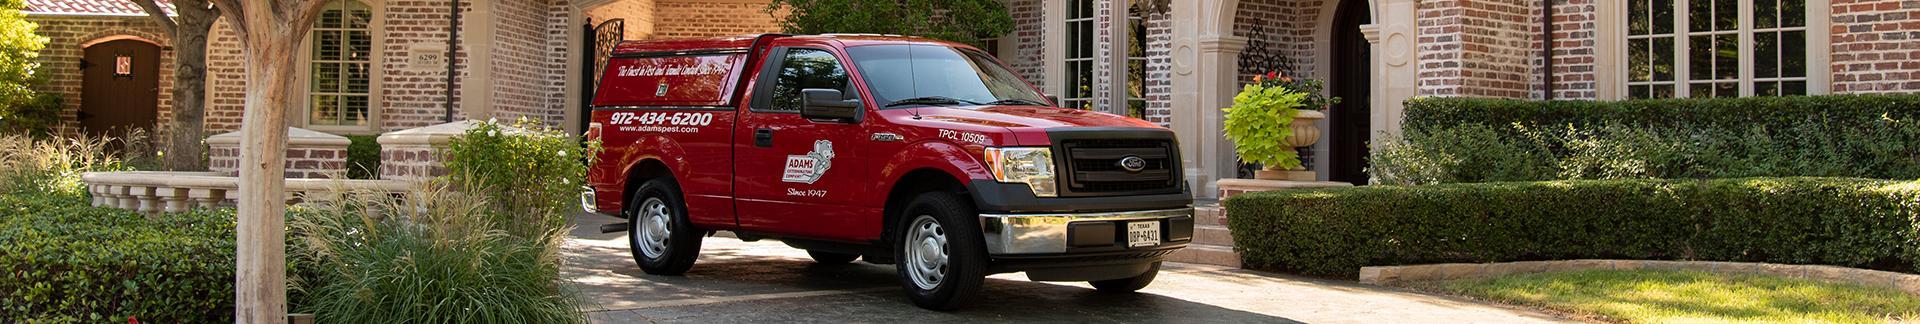 adams pest control's truck in lake dallas tx